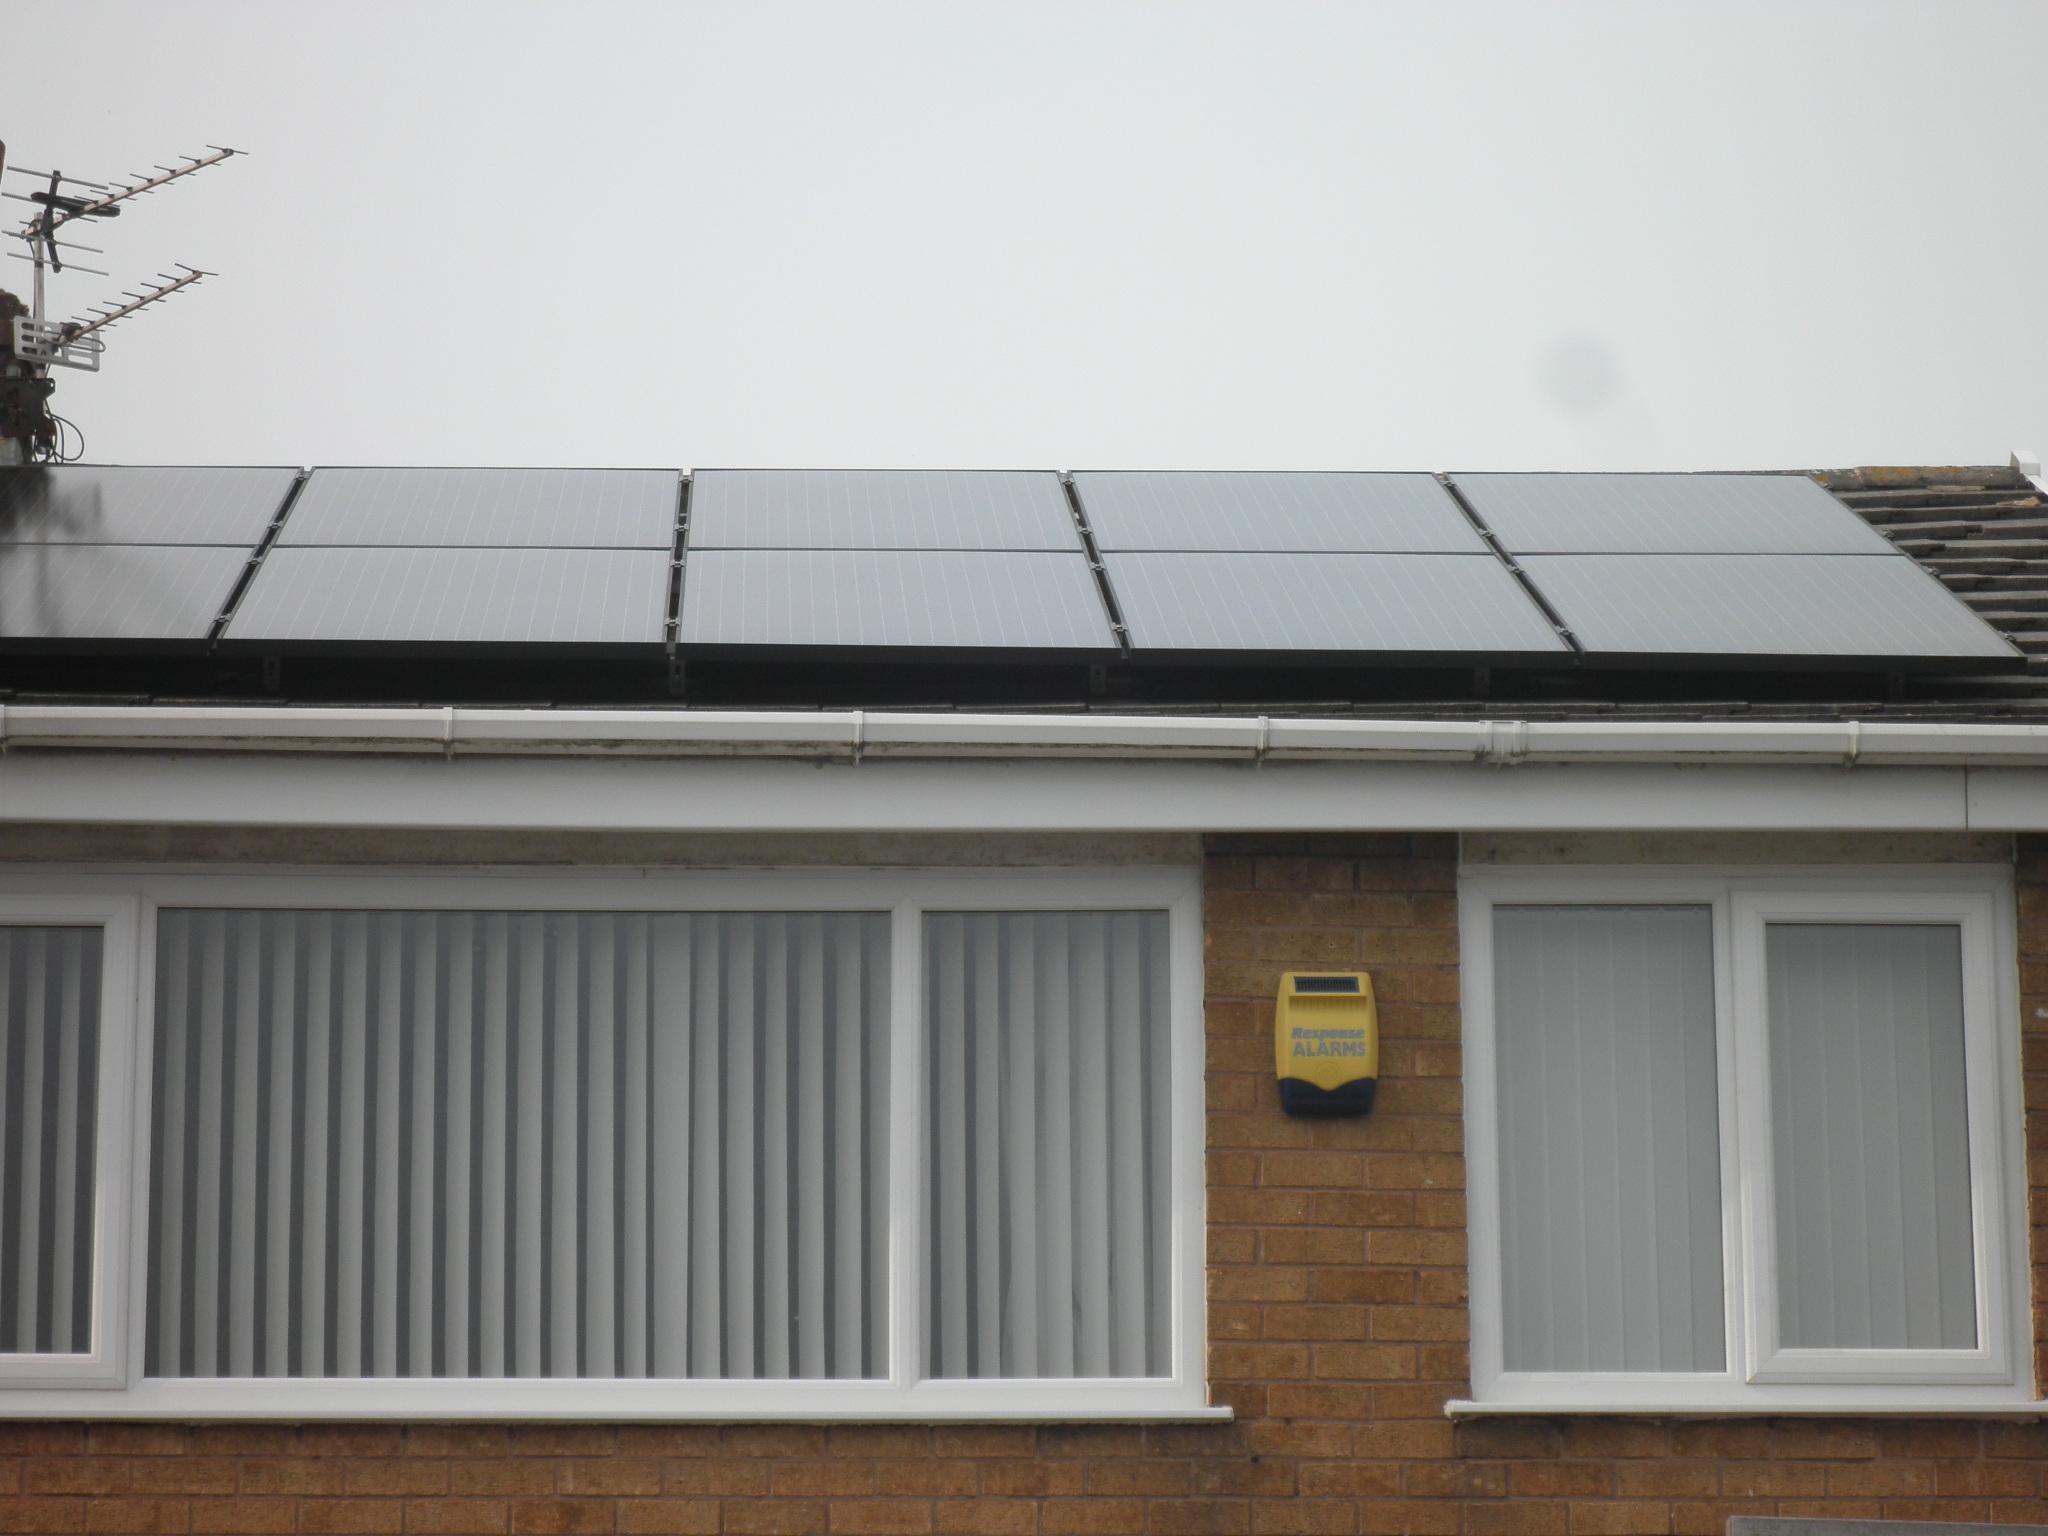 Hanwha Q Cells Korea Announces Solar Module Manufacturing Plant in Georgia